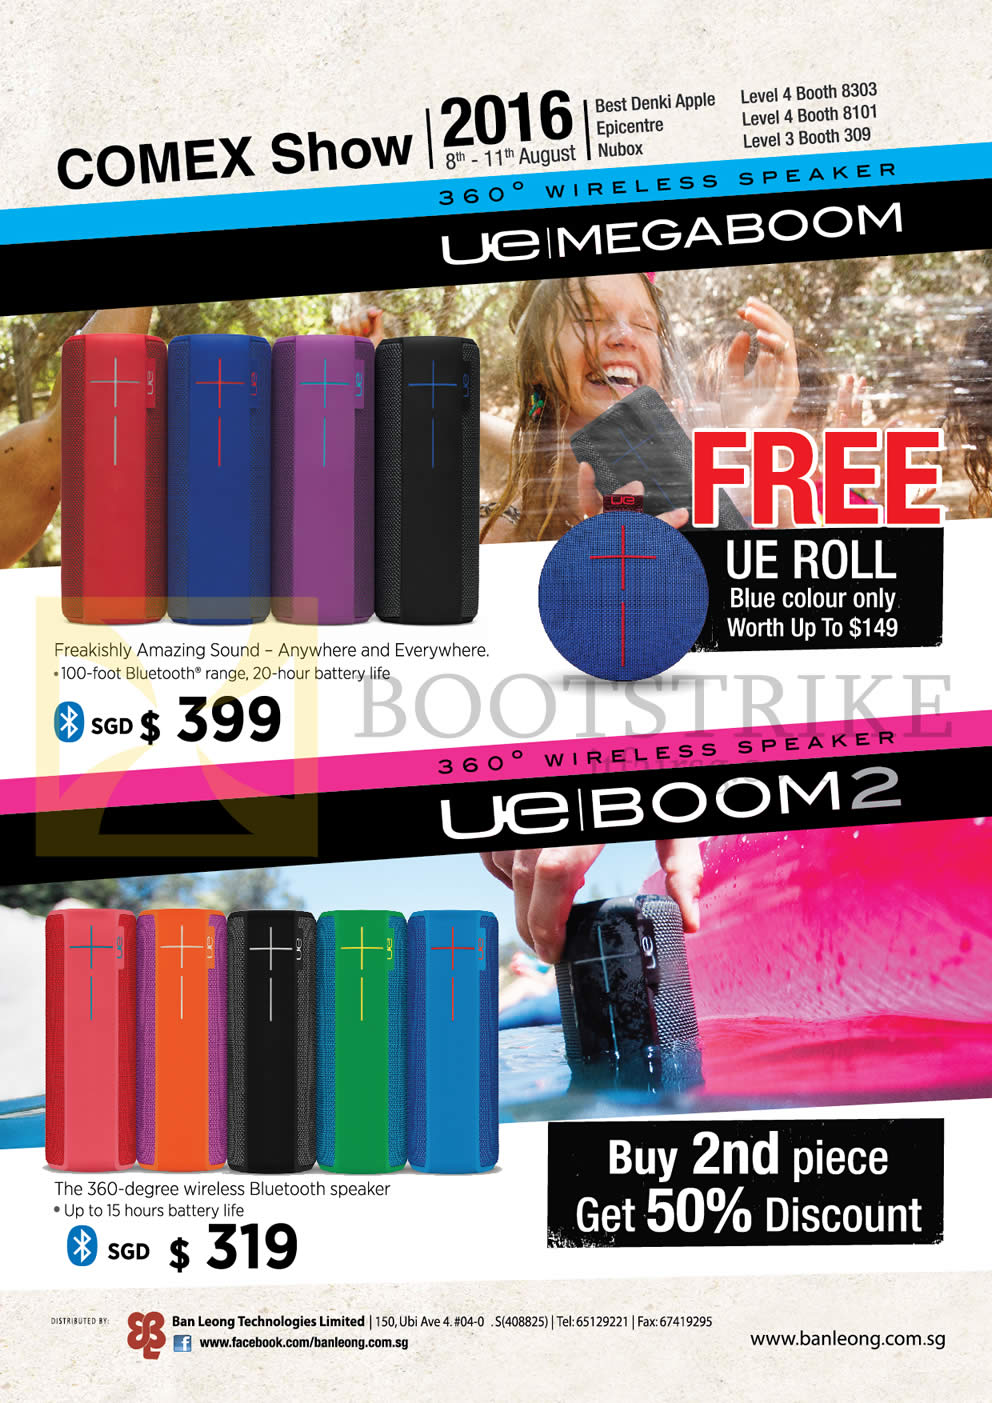 COMEX 2016 price list image brochure of Logitech Ultimate Ears UE Bluetooth Speakers Megaboom, Roll, Boom 2